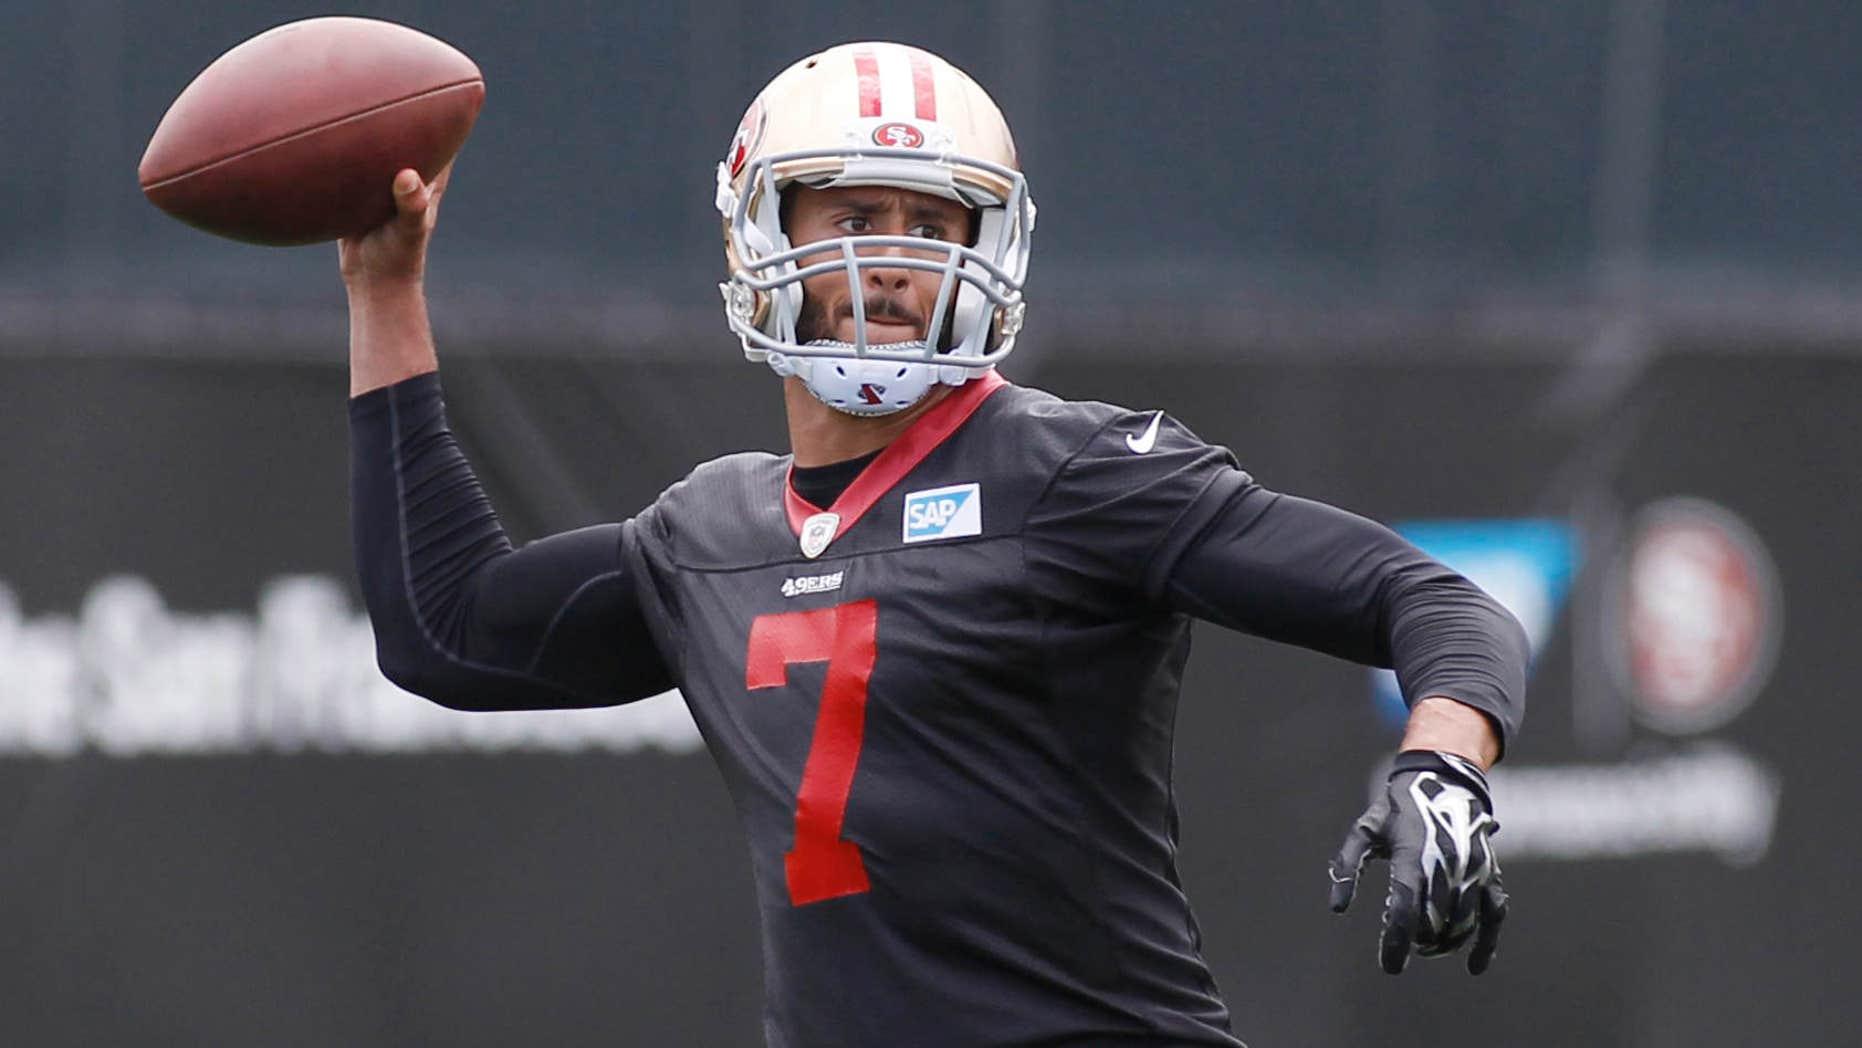 May 21, 2015: San Francisco 49ers quarterback Colin Kaepernick throws the ball during NFL football practice.